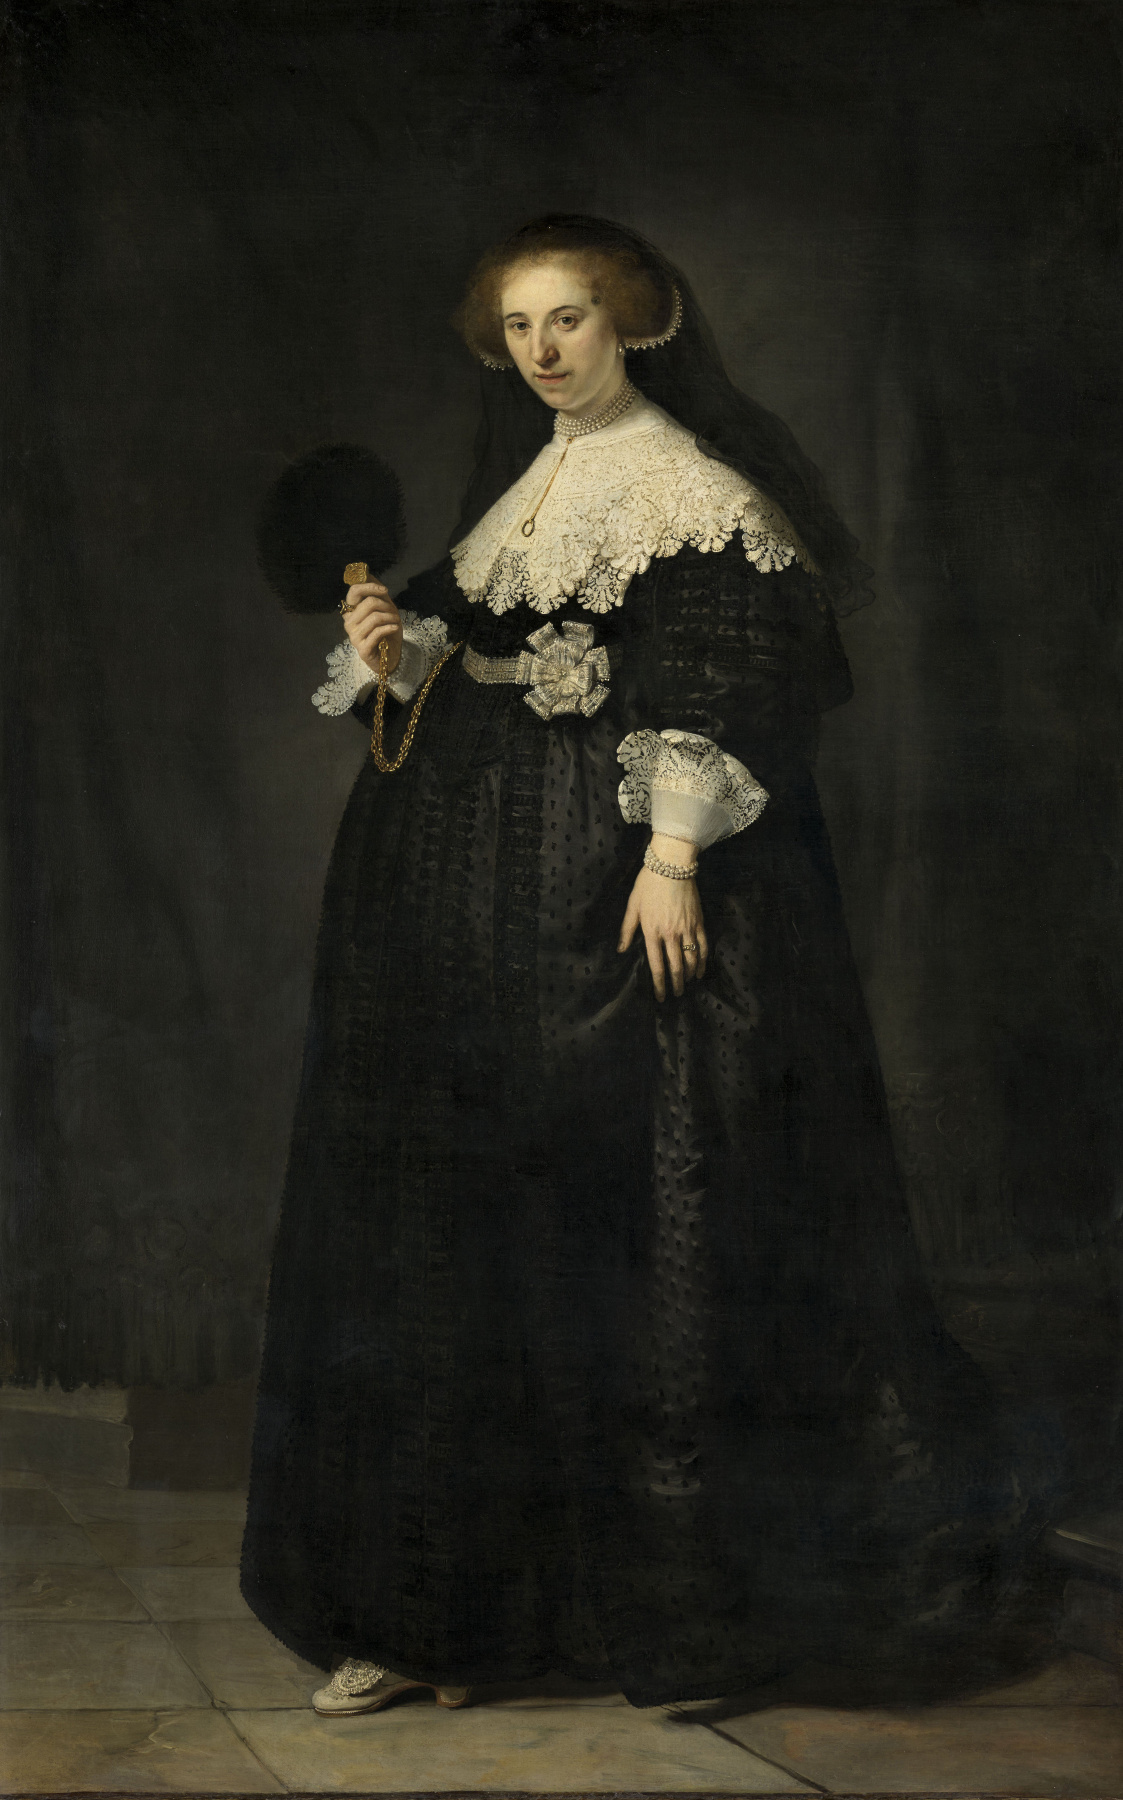 Rembrandt Harmenszoon van Rijn. Portrait of Oopjen Coppit